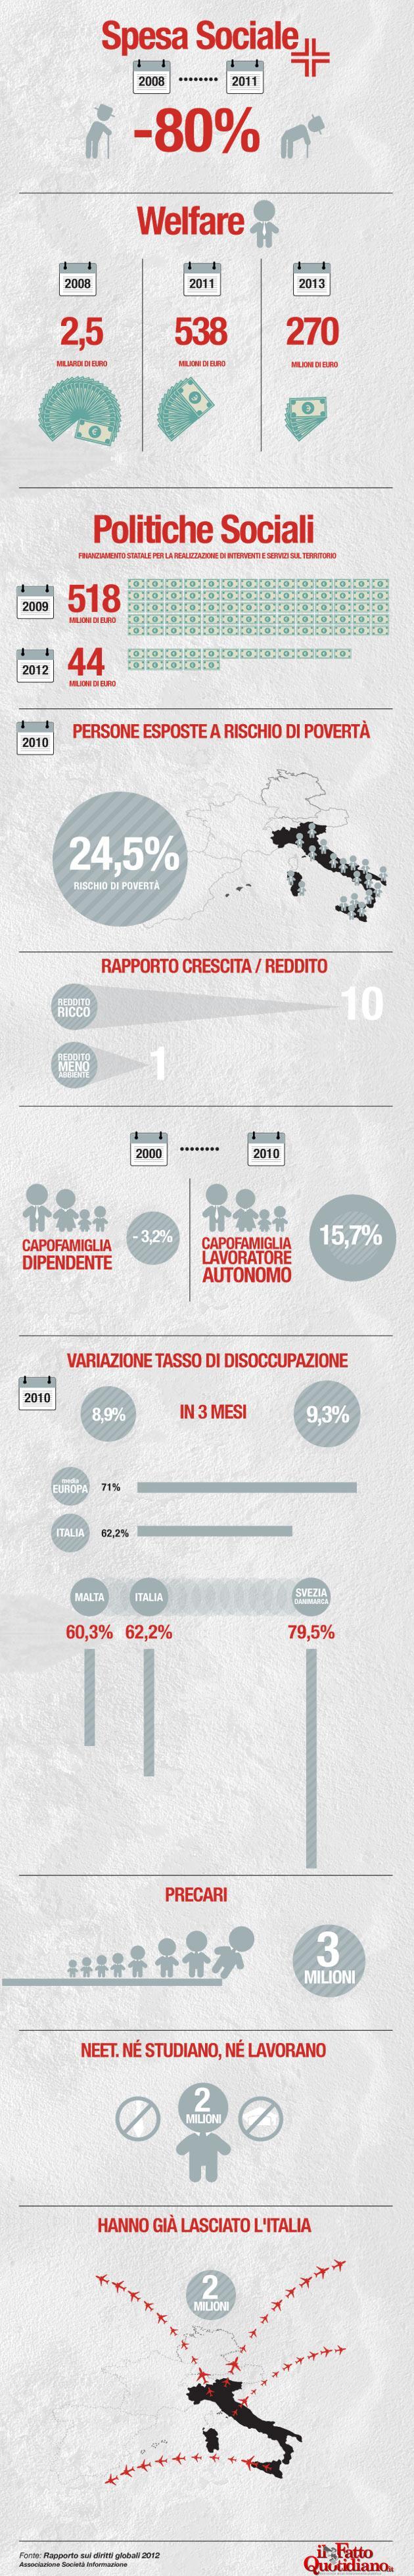 infografica-crisi